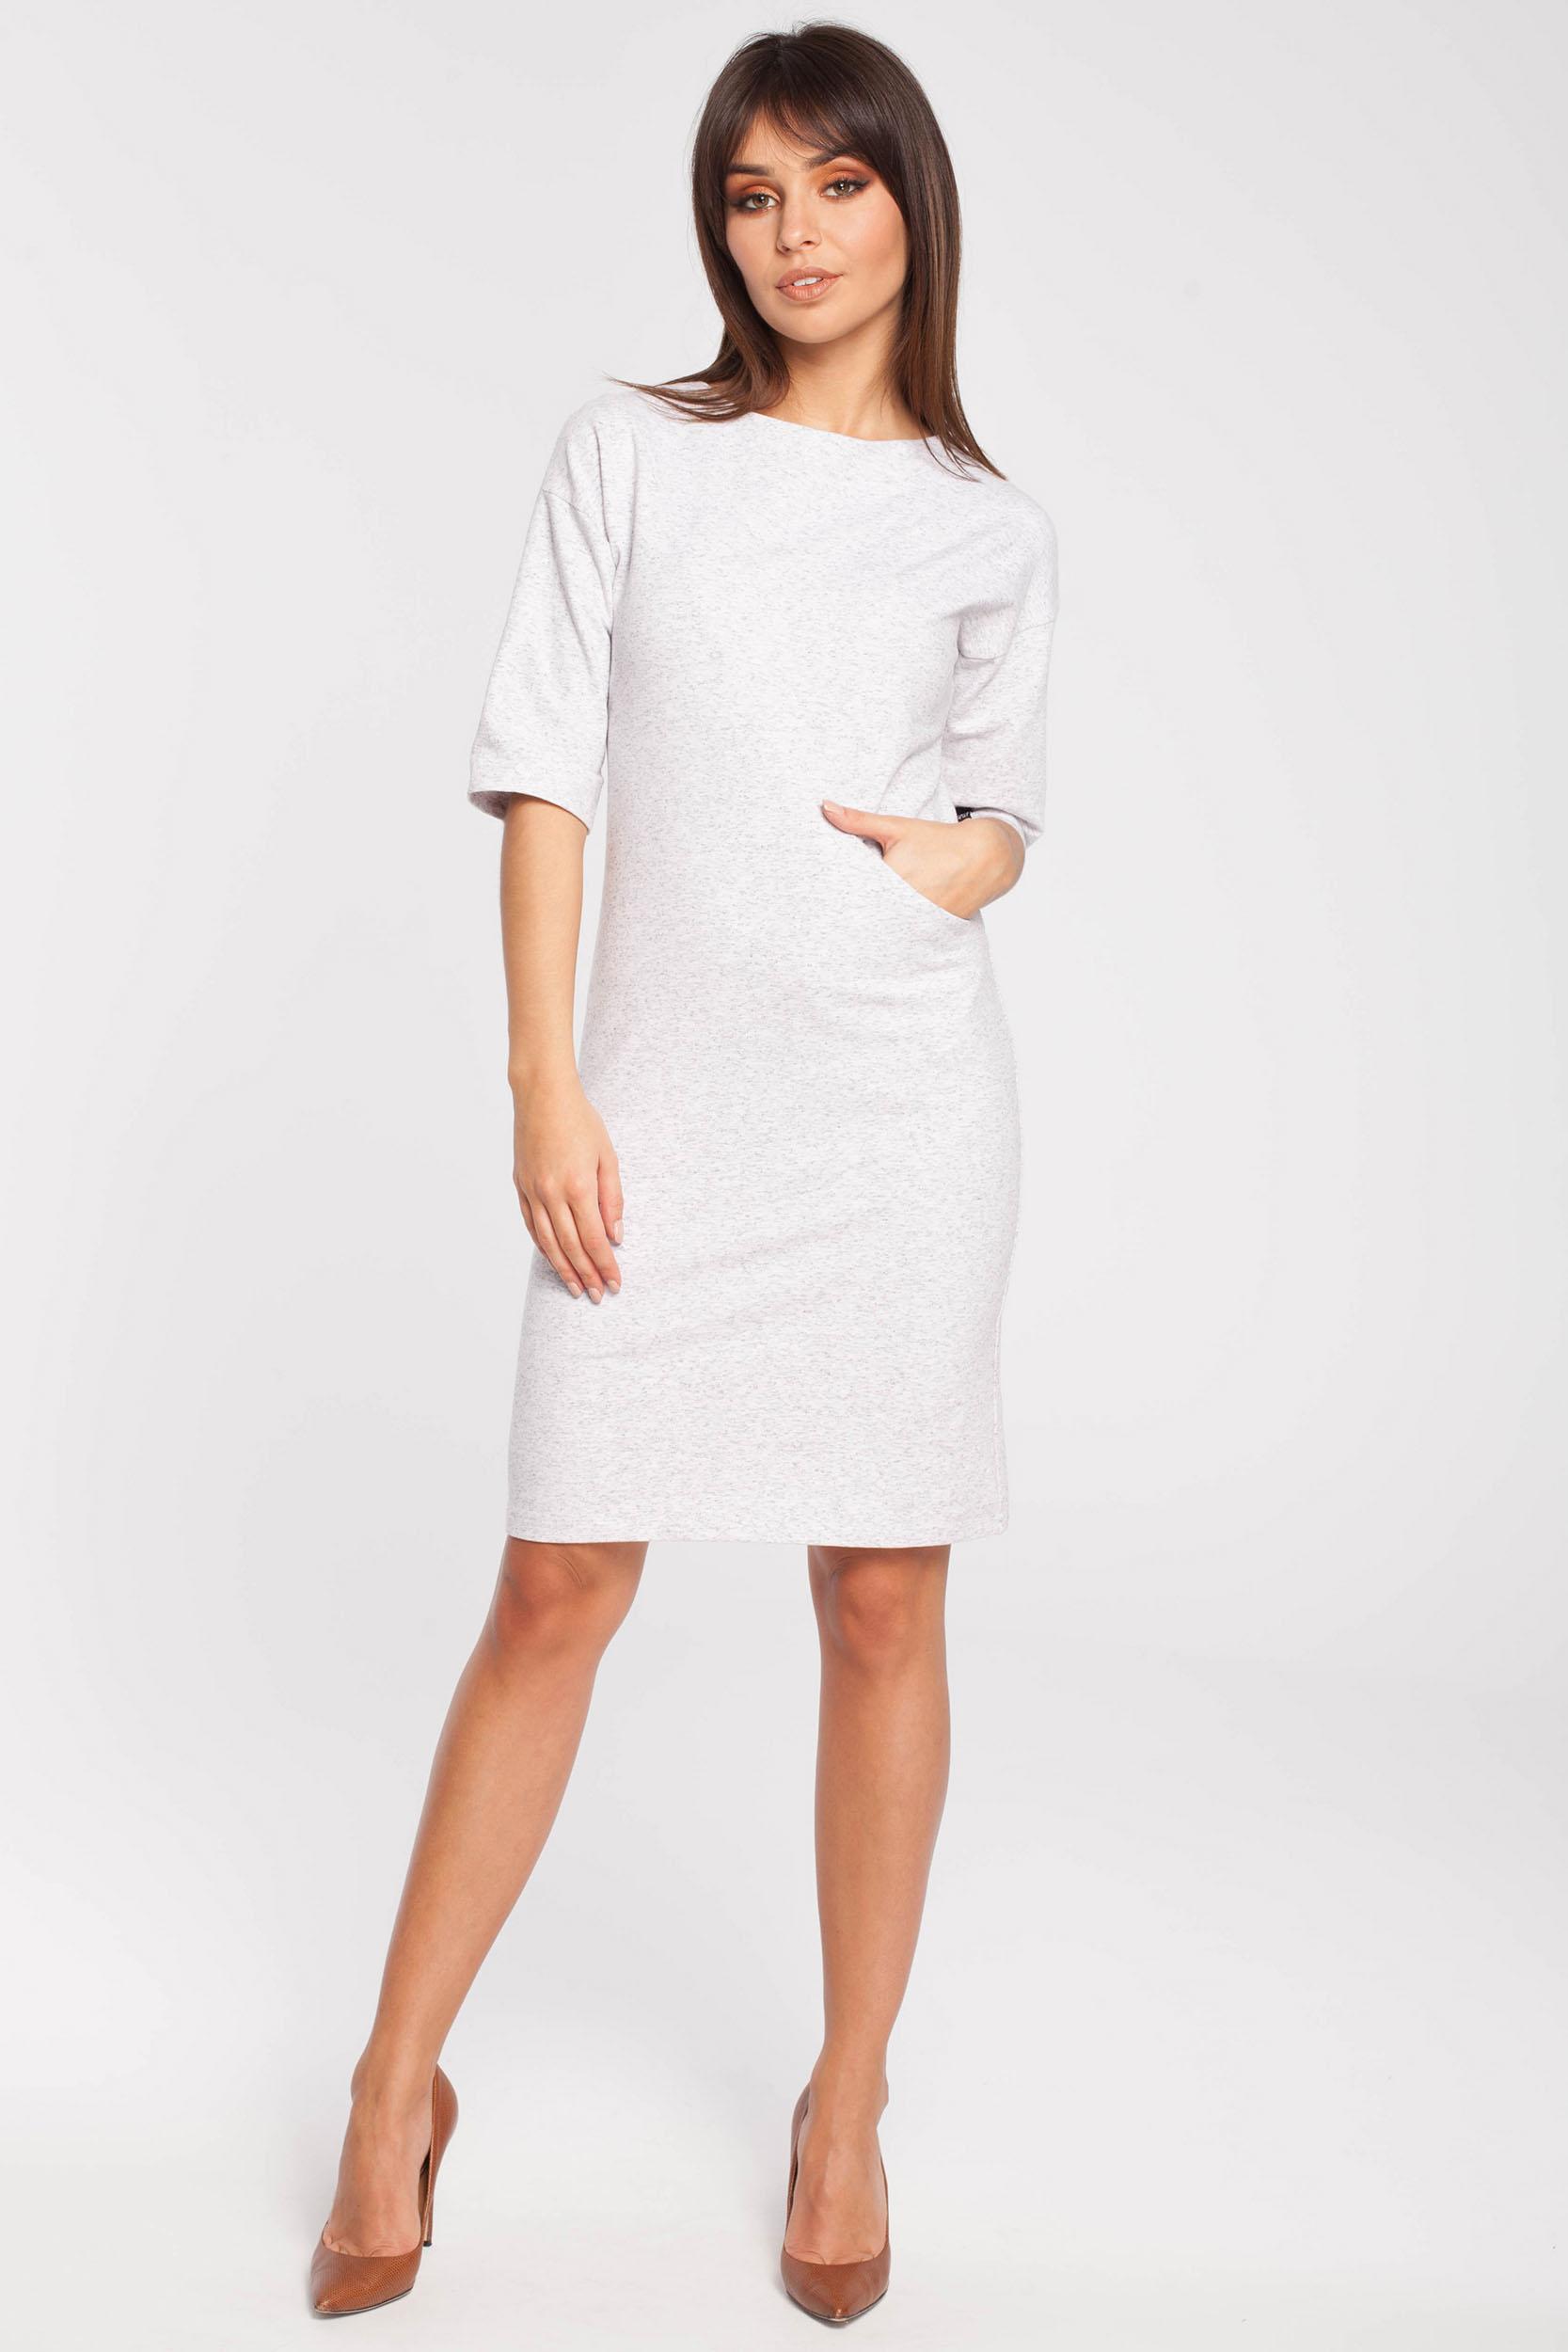 CM2783 Dresowa sukienka biurowa - stracciatella